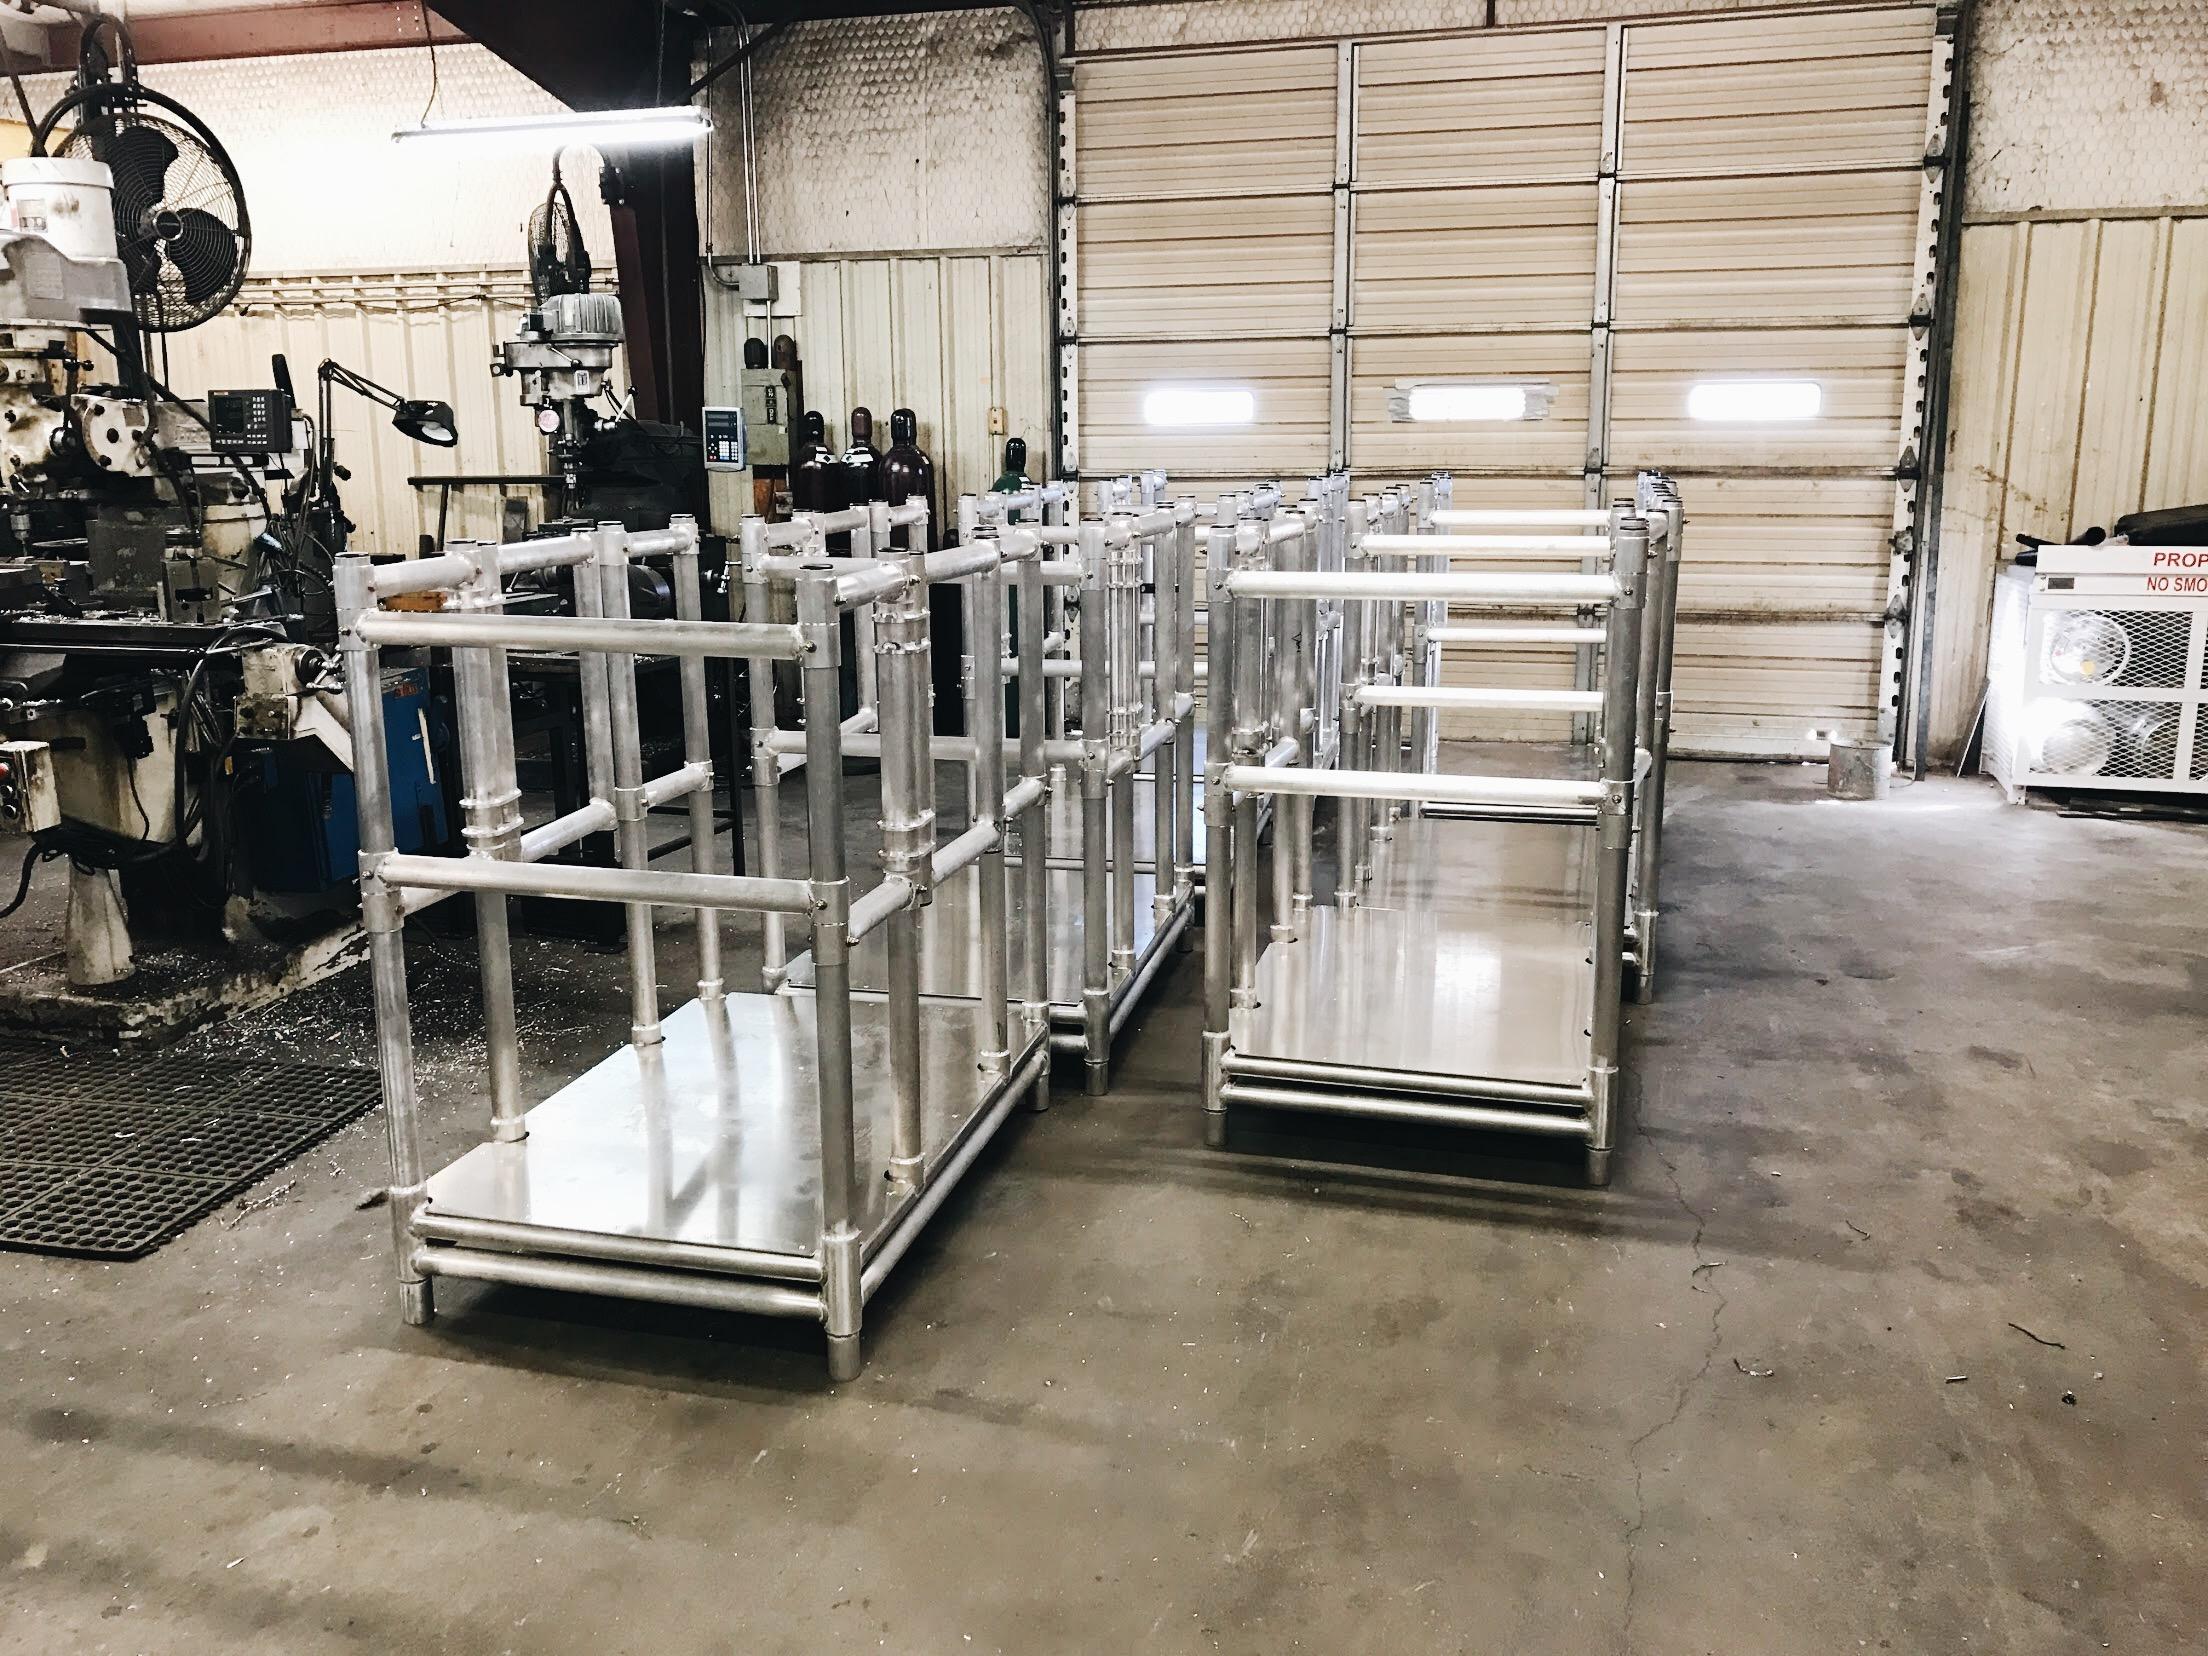 fabrication texas industrial machine & design 1.jpg